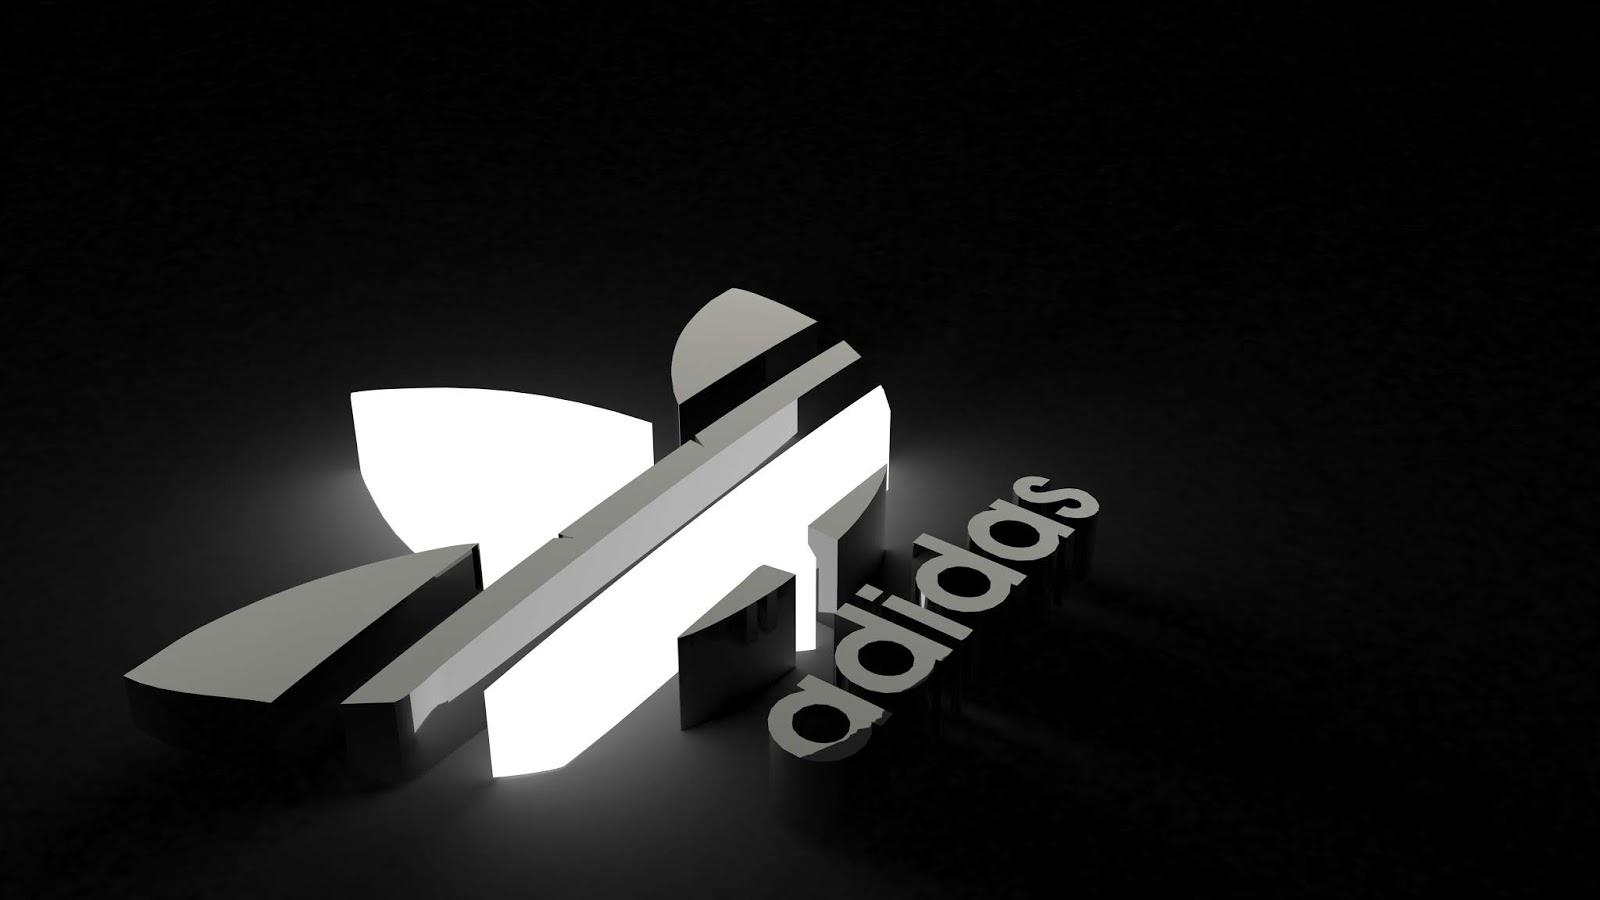 Adidas, Logo, 3D, Black, Monochrome, 5K, Sports